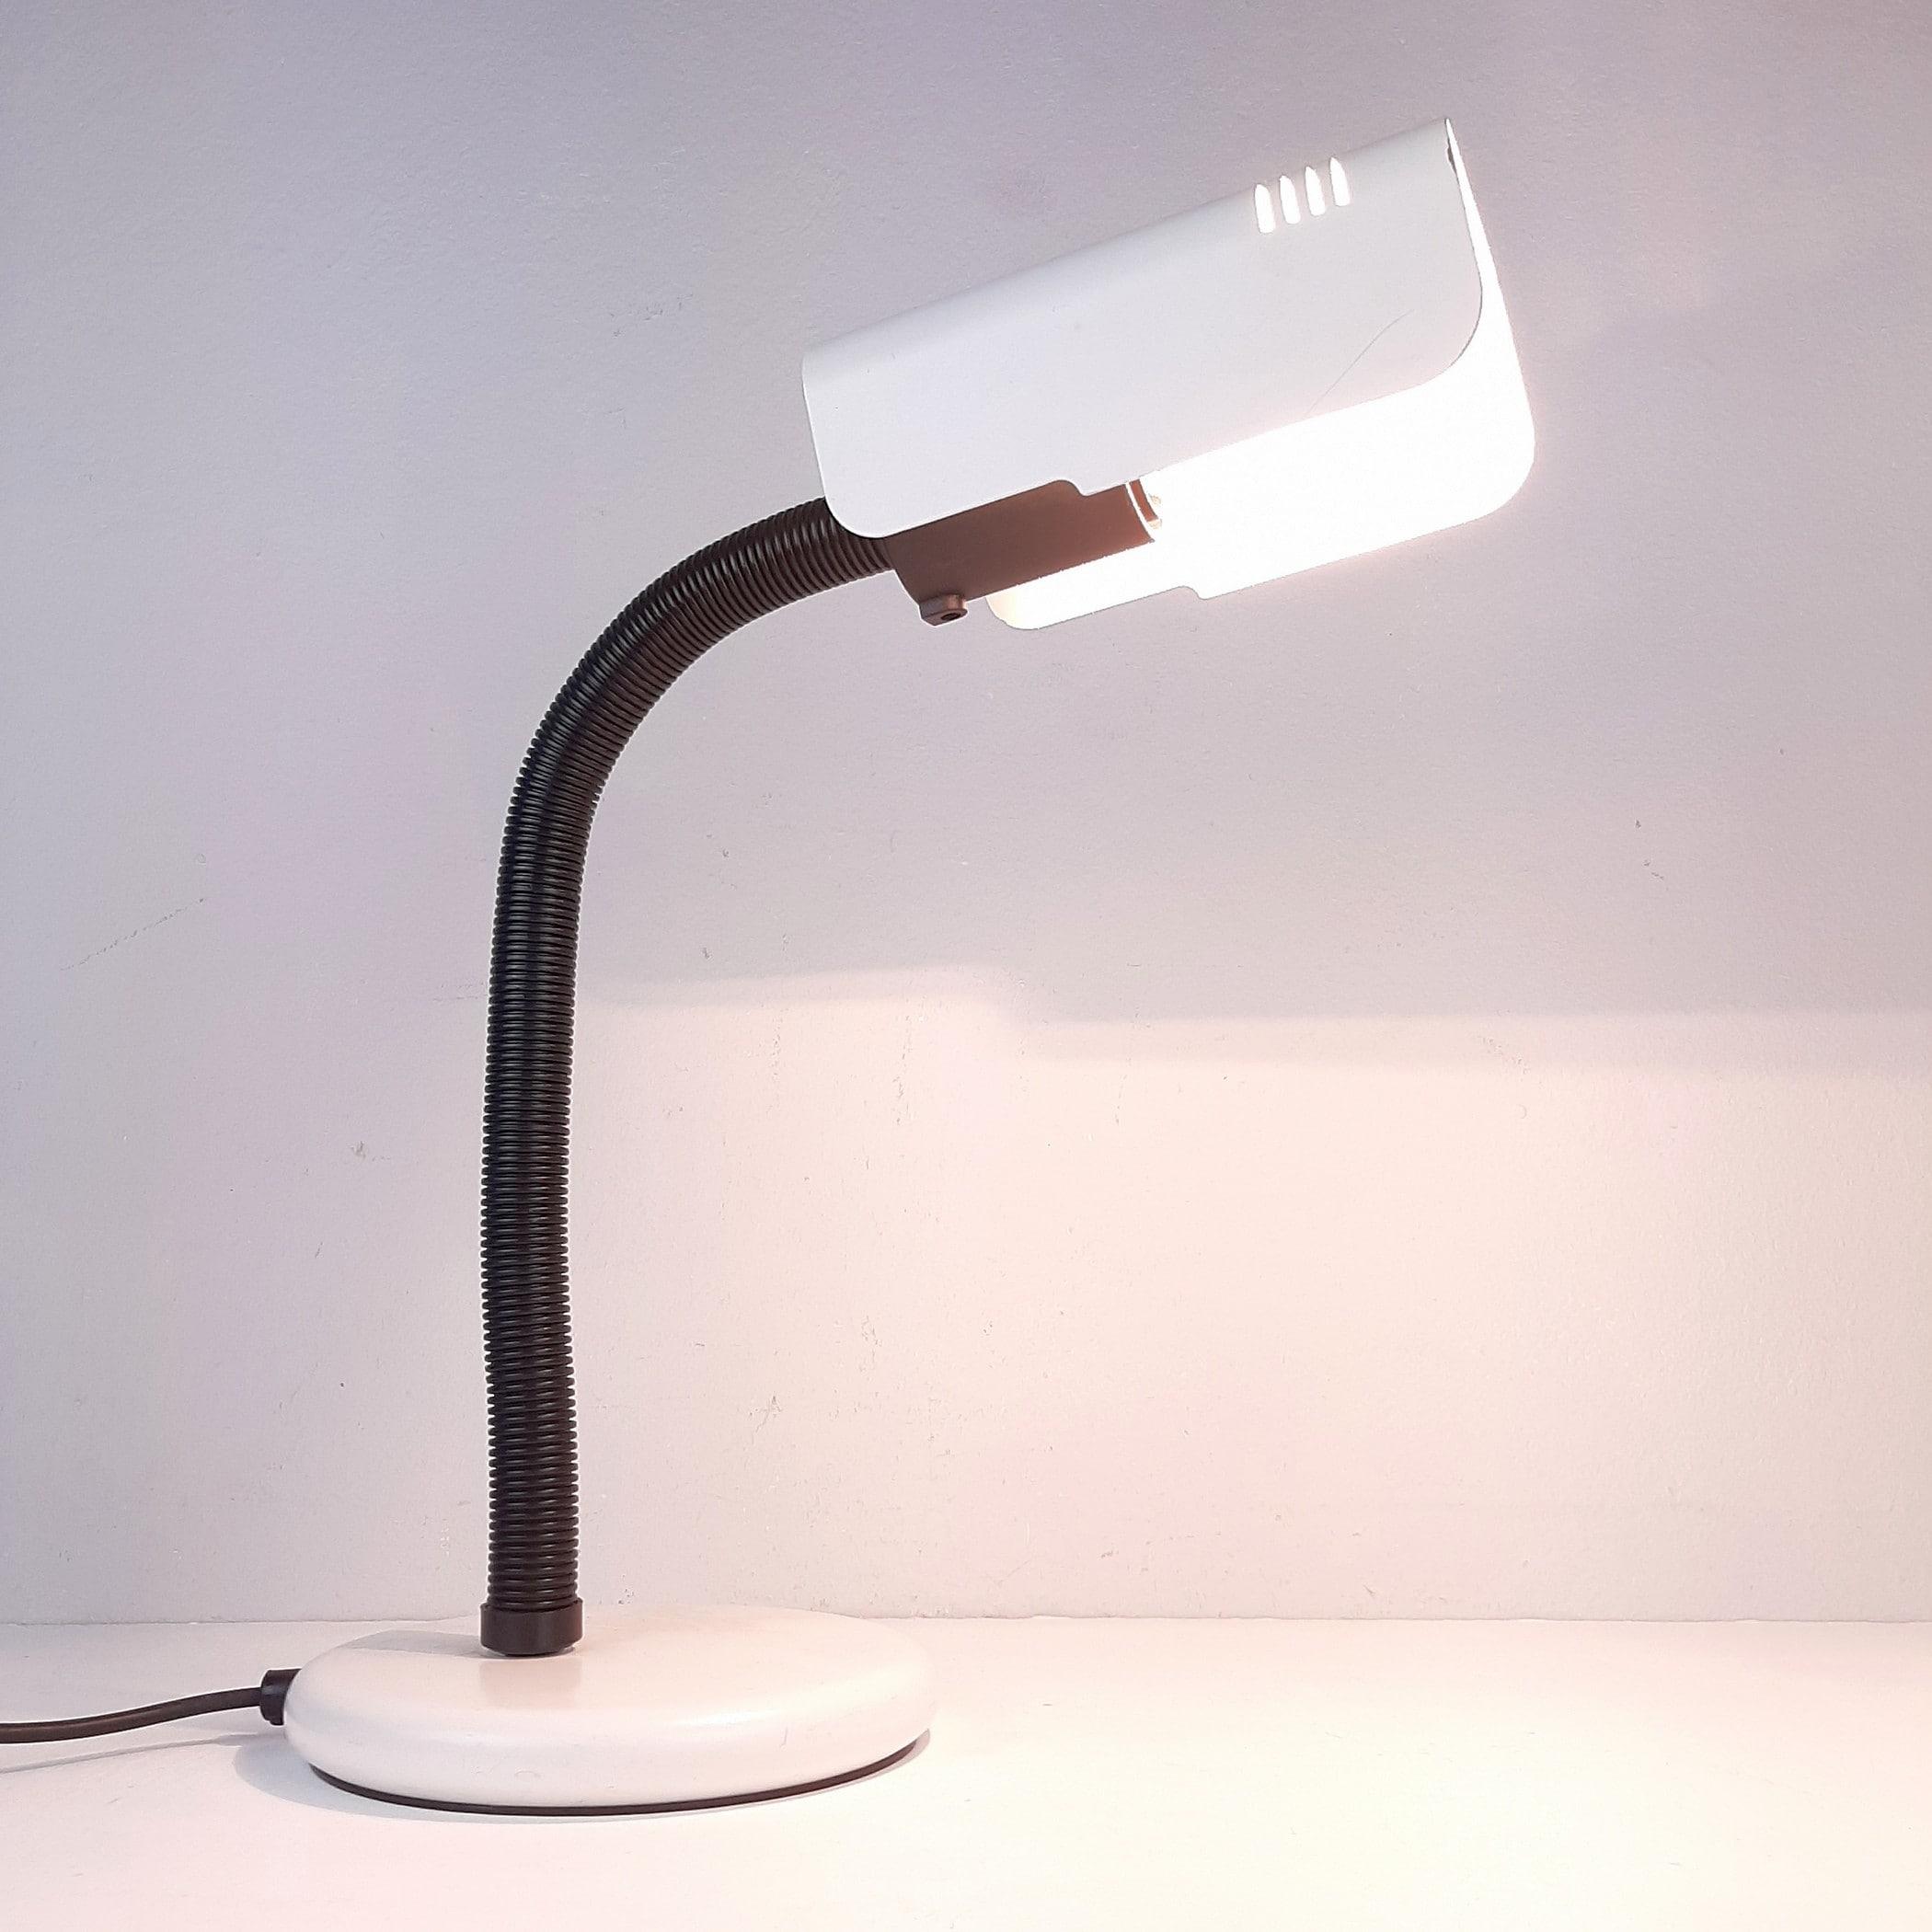 Mid-century Italian Targetti Design Gooseneck Desk Lamp Adjustable Italy 80s